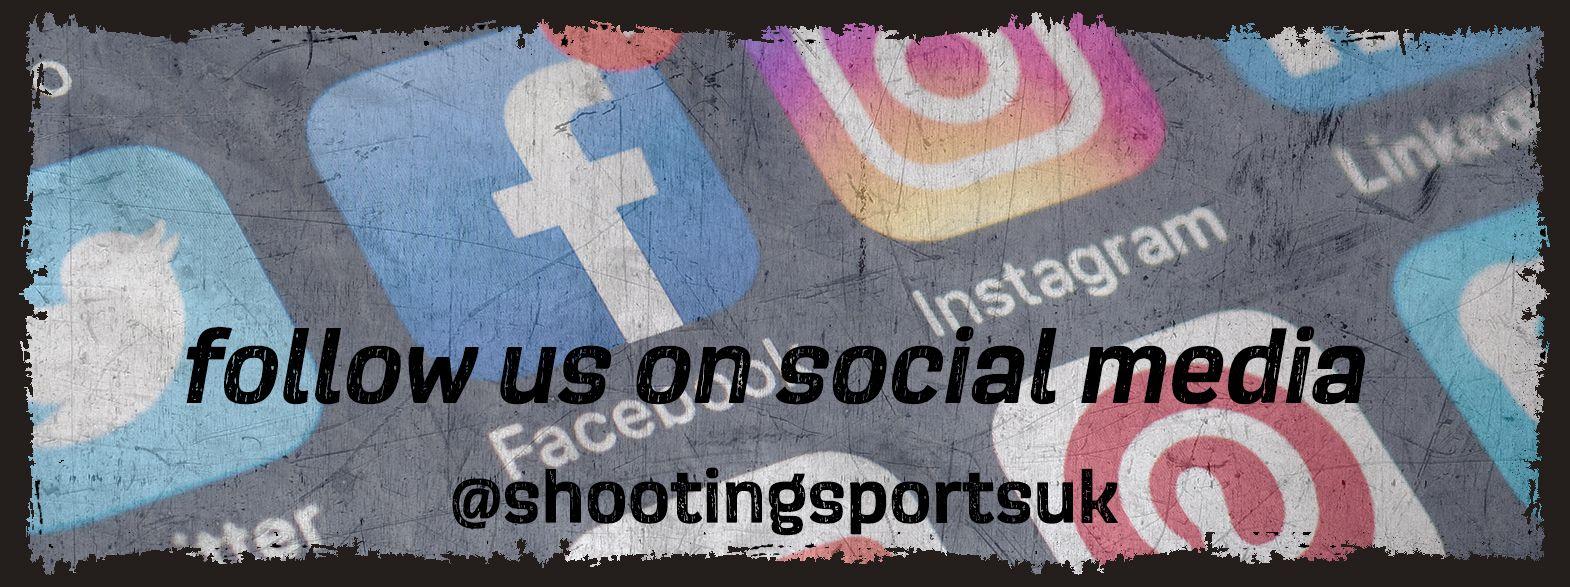 Shooting Sports UK LTD